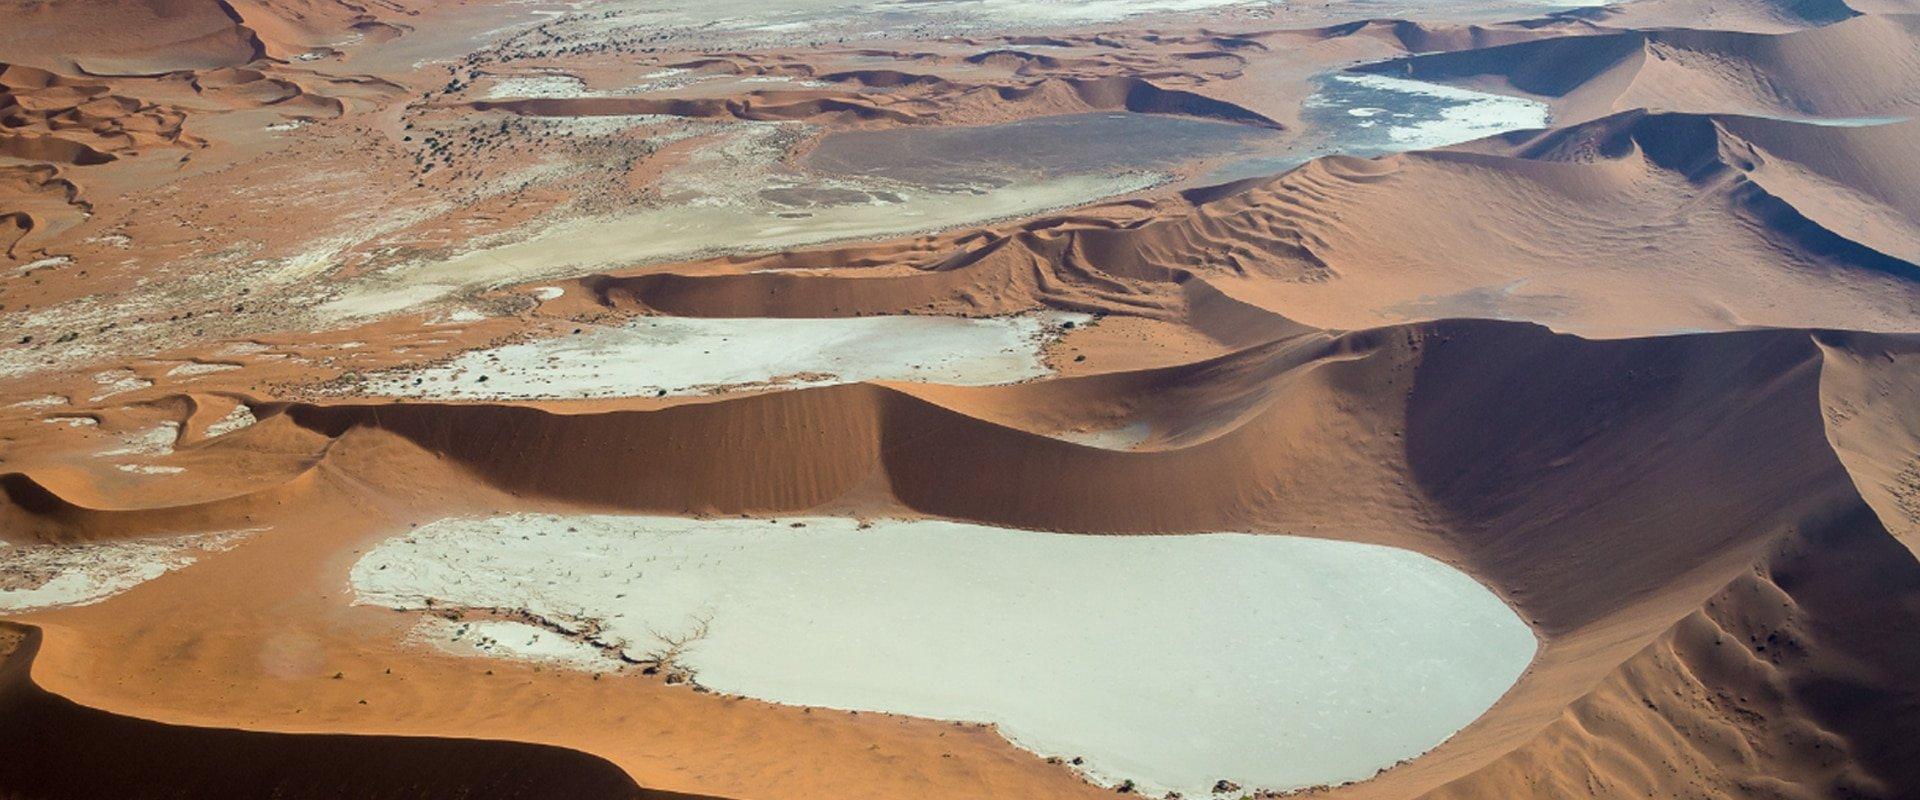 Climb the towering orange sand dunes